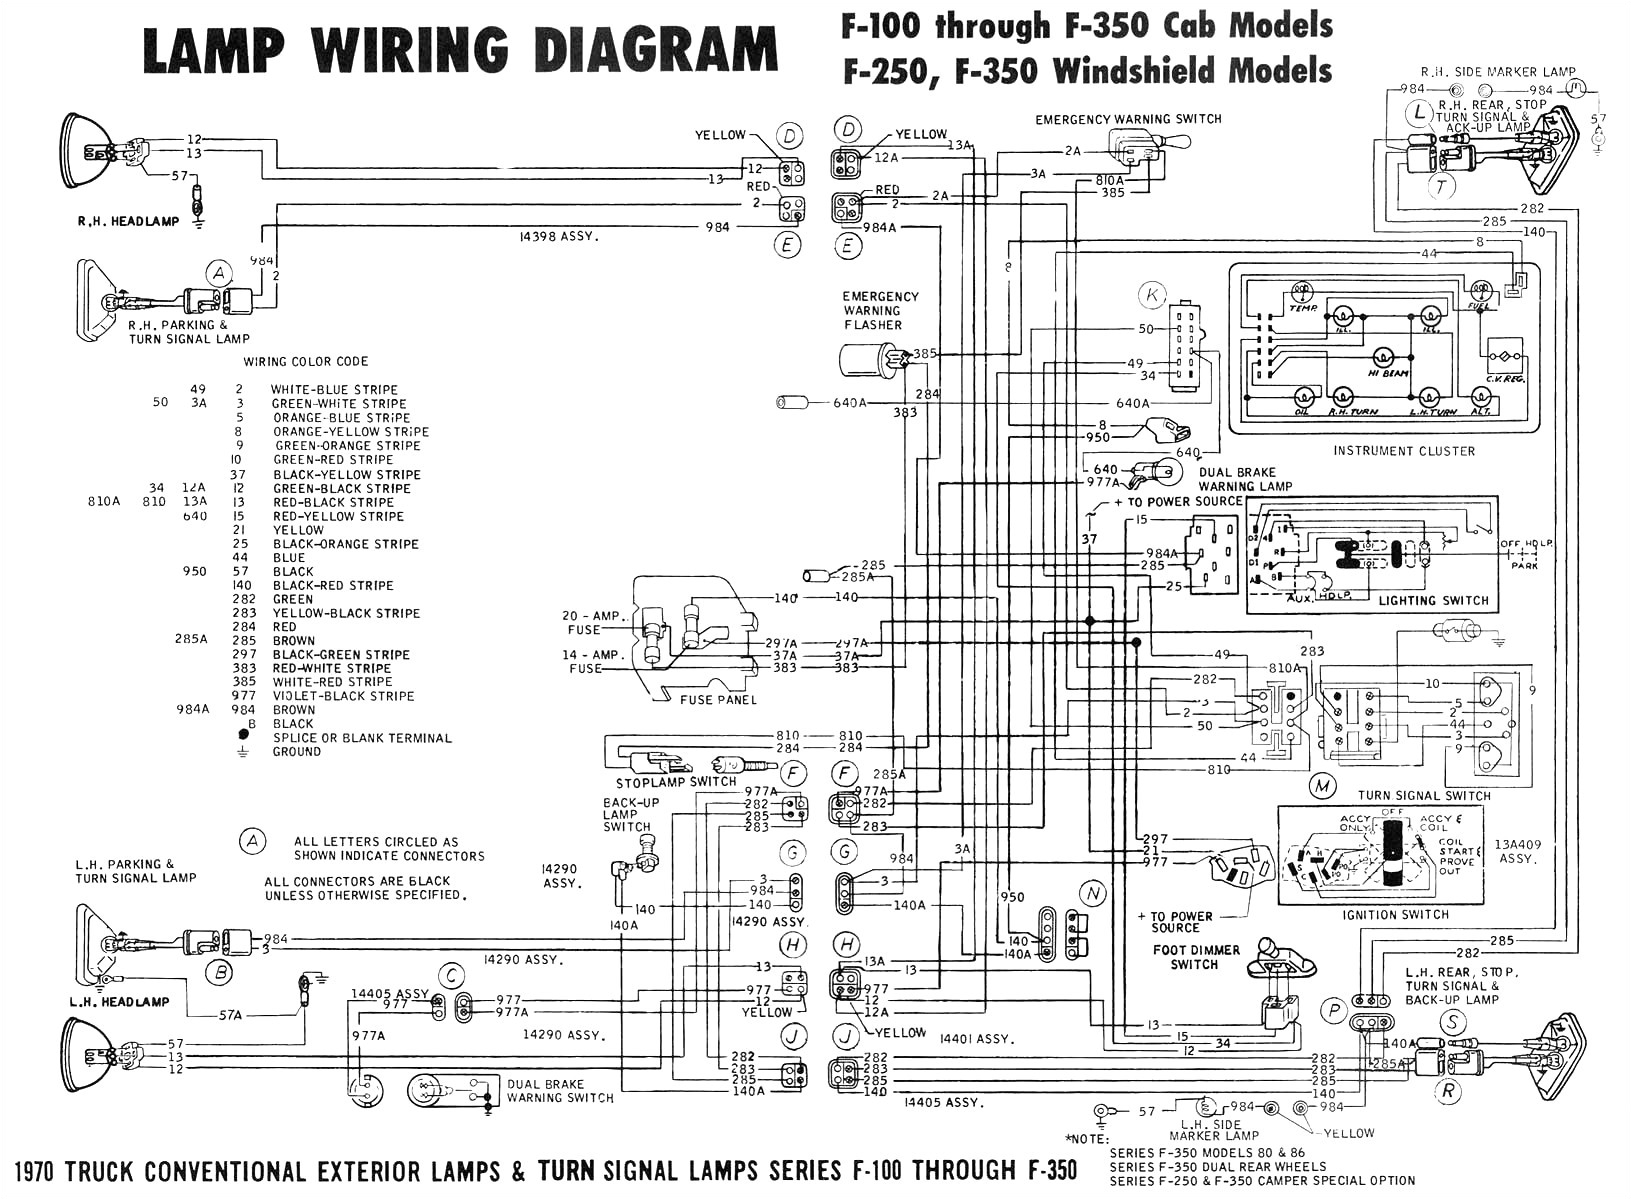 pin truck diagram free download wiring diagram schematic wiring 1976 chevy plug wiring diagram schematic